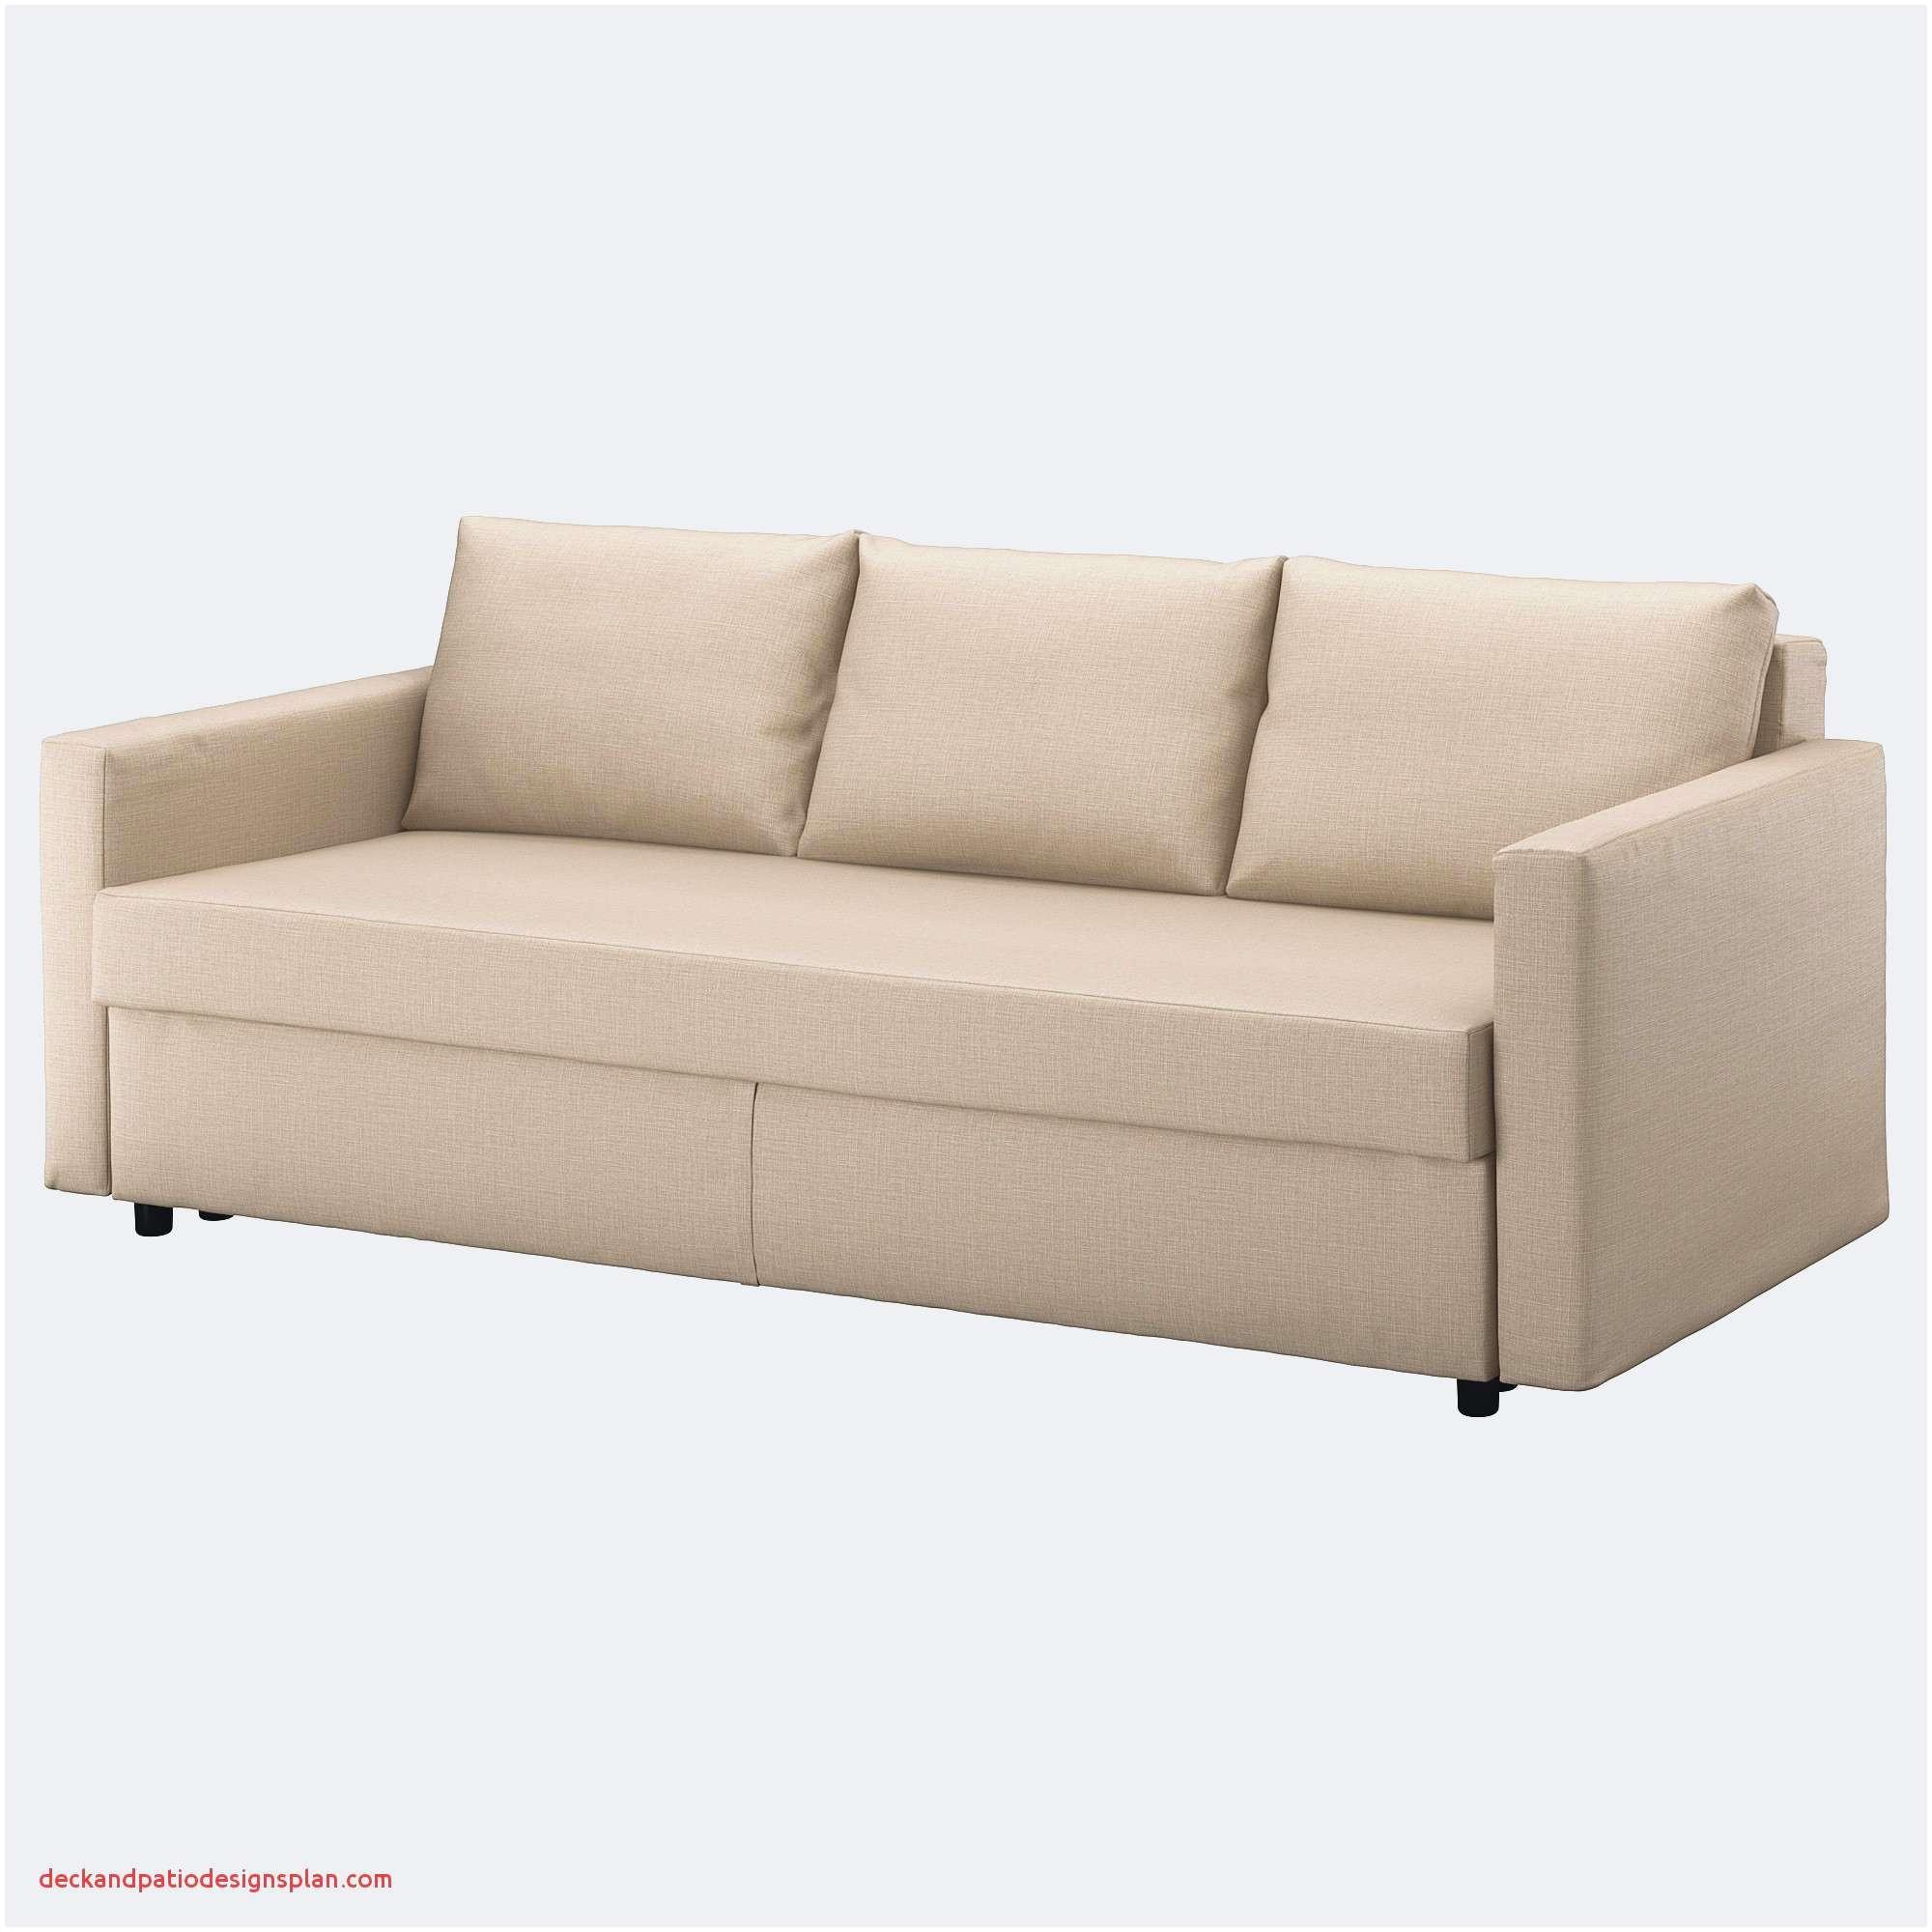 frais ikea stockholm lampe sofa bed ikea usa lovely wicker outdoor sofa 0d pour option lampe ikea